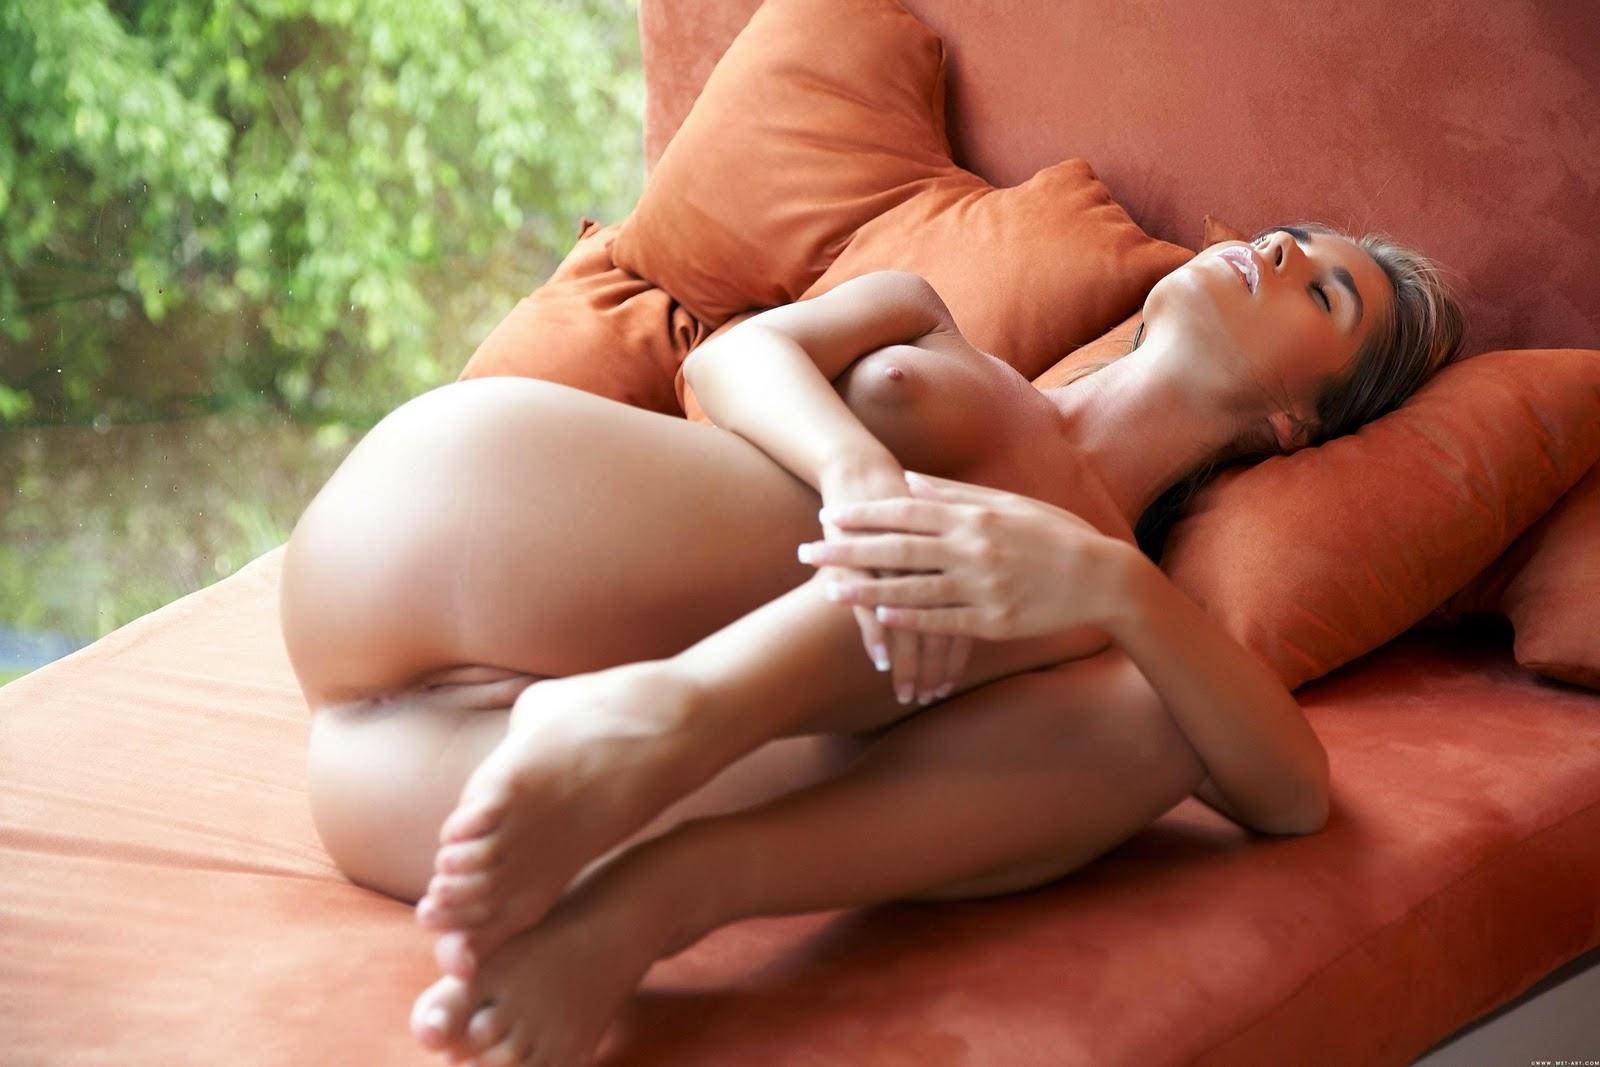 Celeb Sexy Nude Hd Wallpaper Jpg